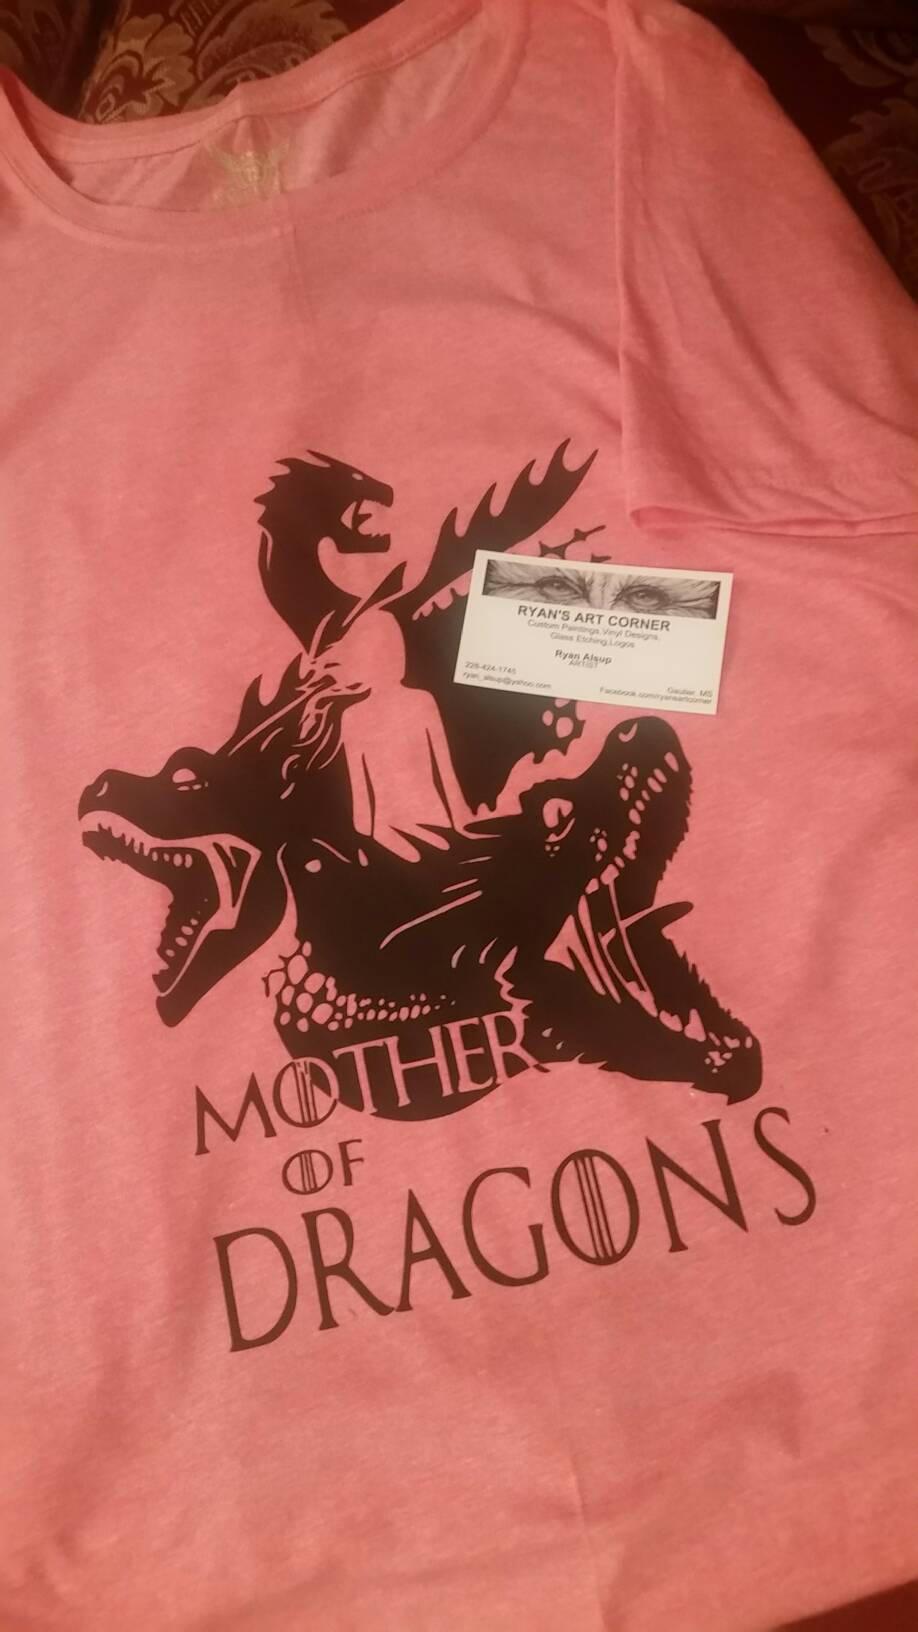 Game of Thrones Daenerys Targaryen Mother of Dragons Adult